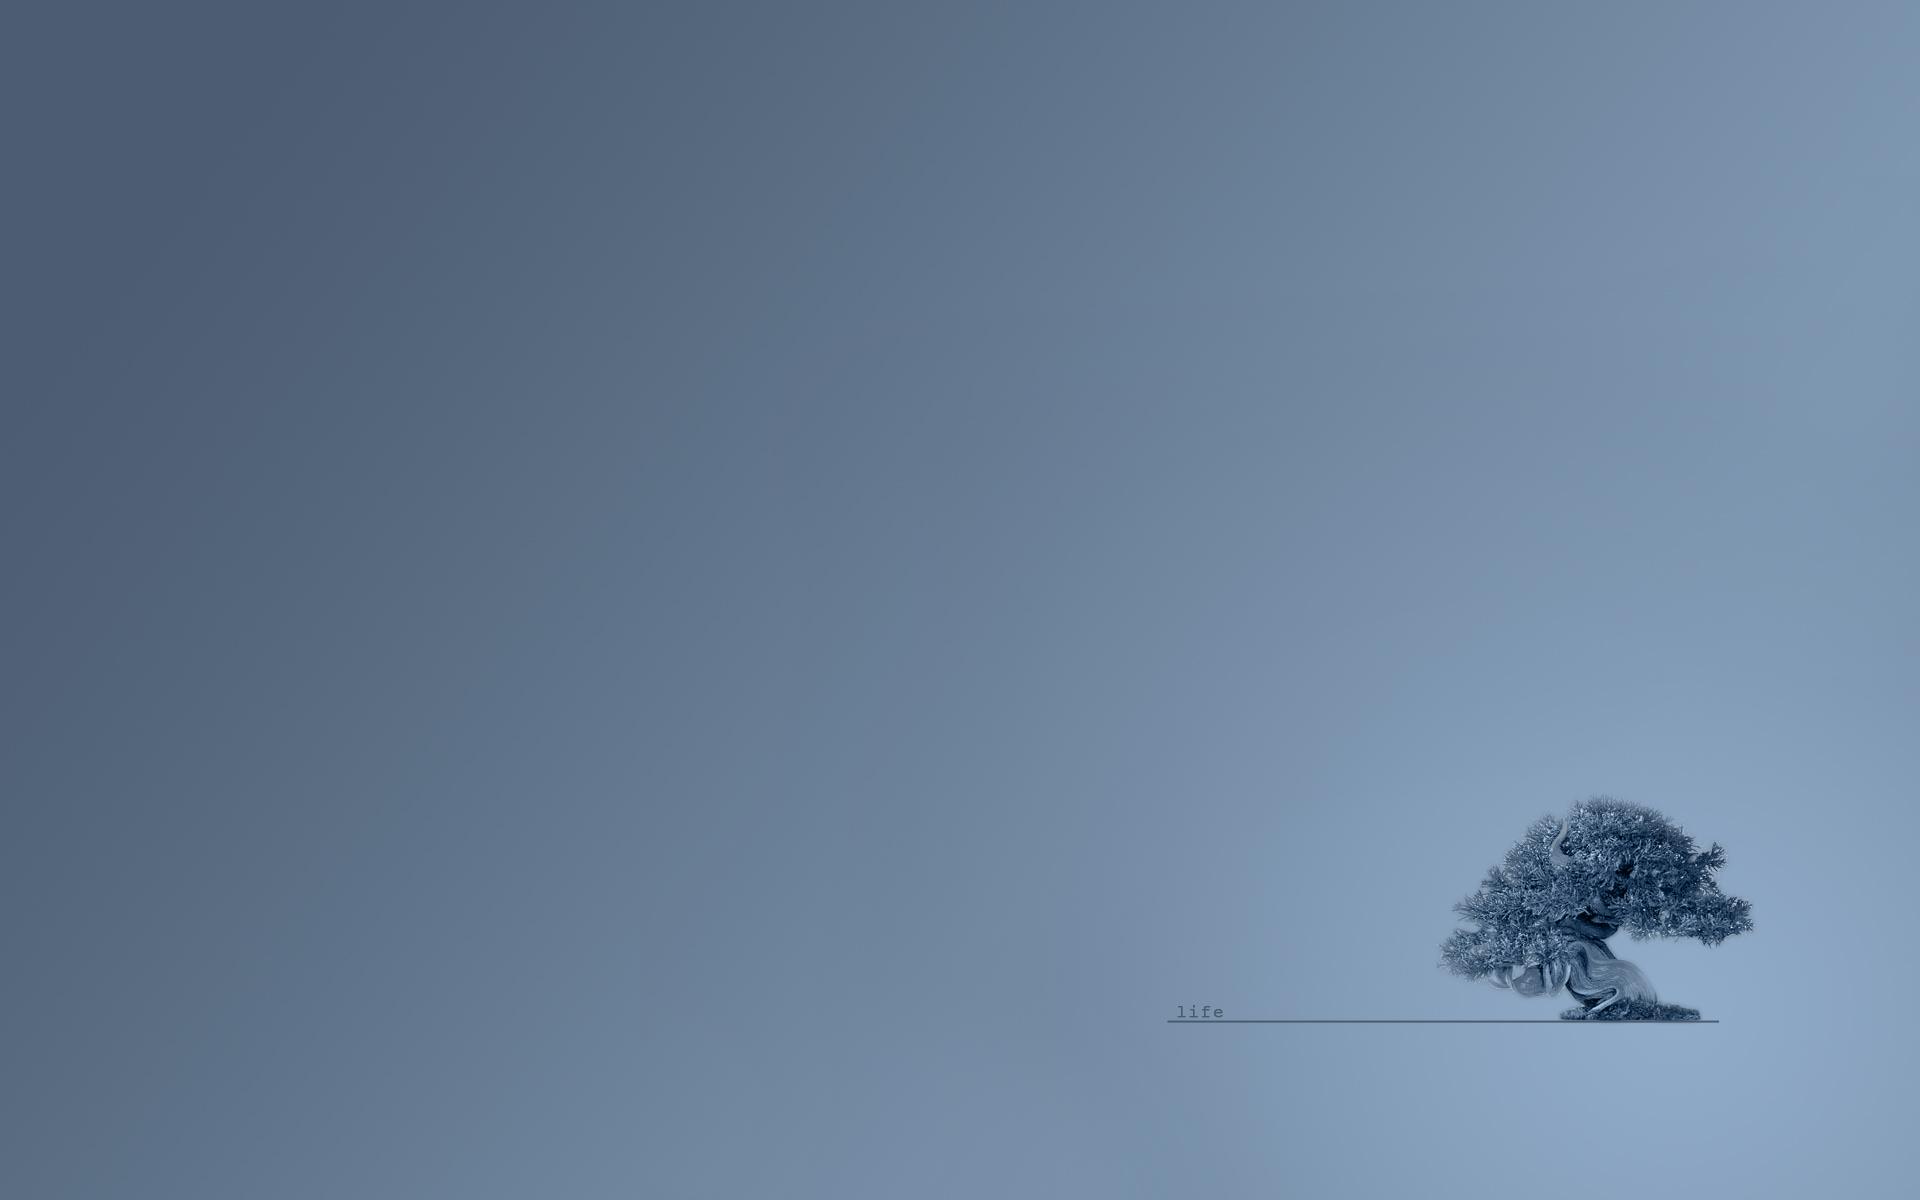 minimalist wallpaper for pc